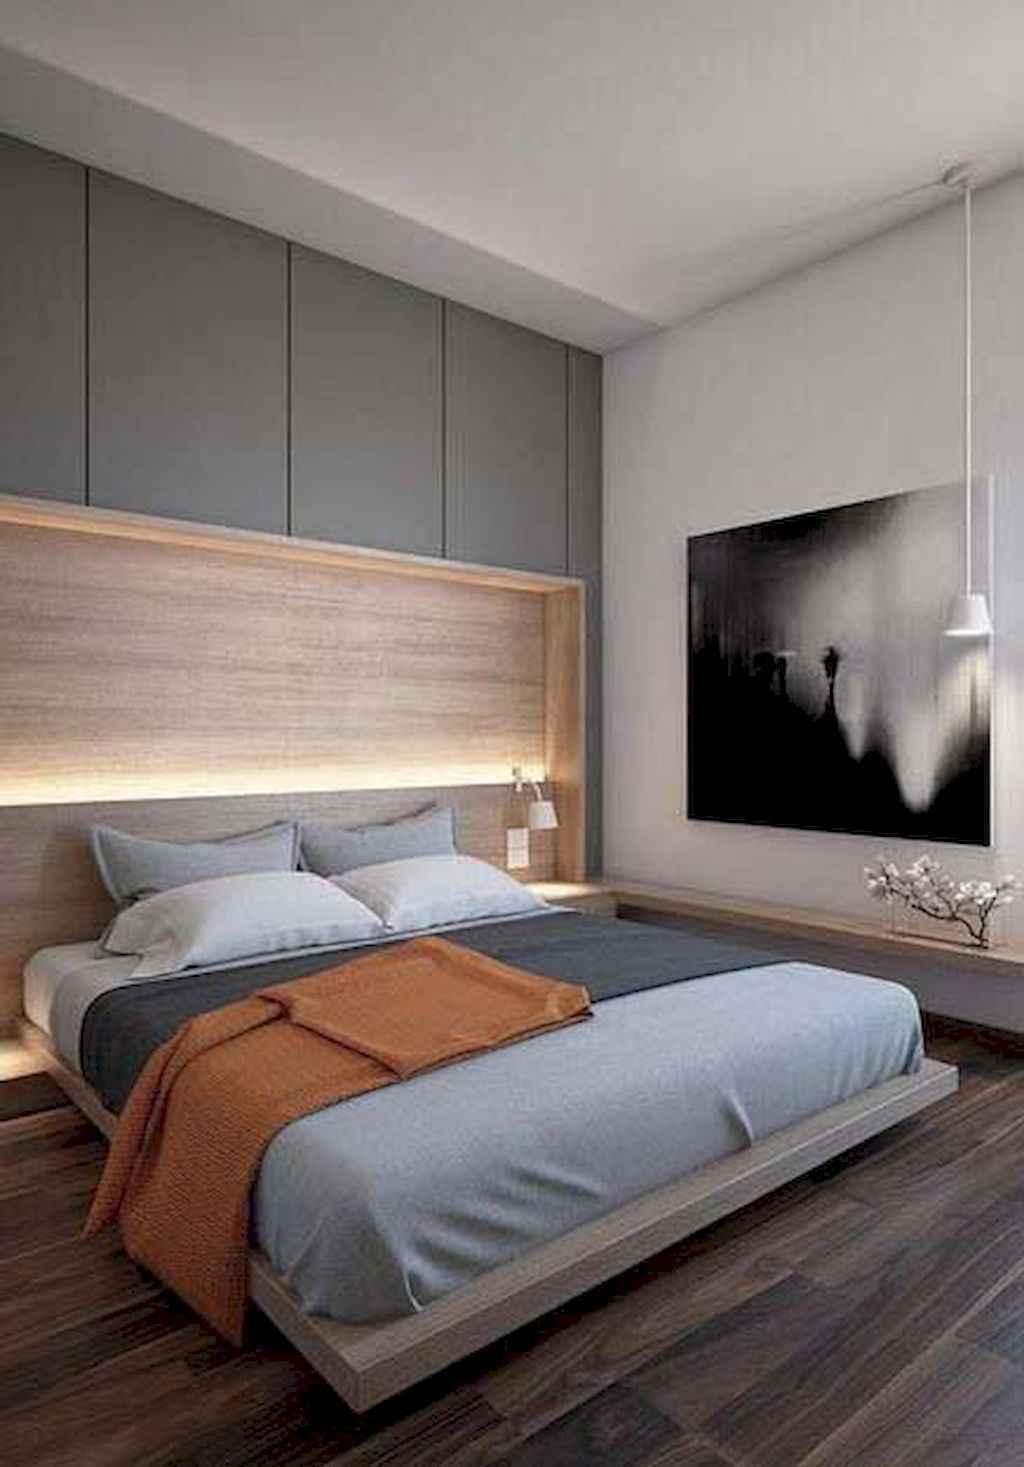 60 simply small master bedroom decor ideas (50)